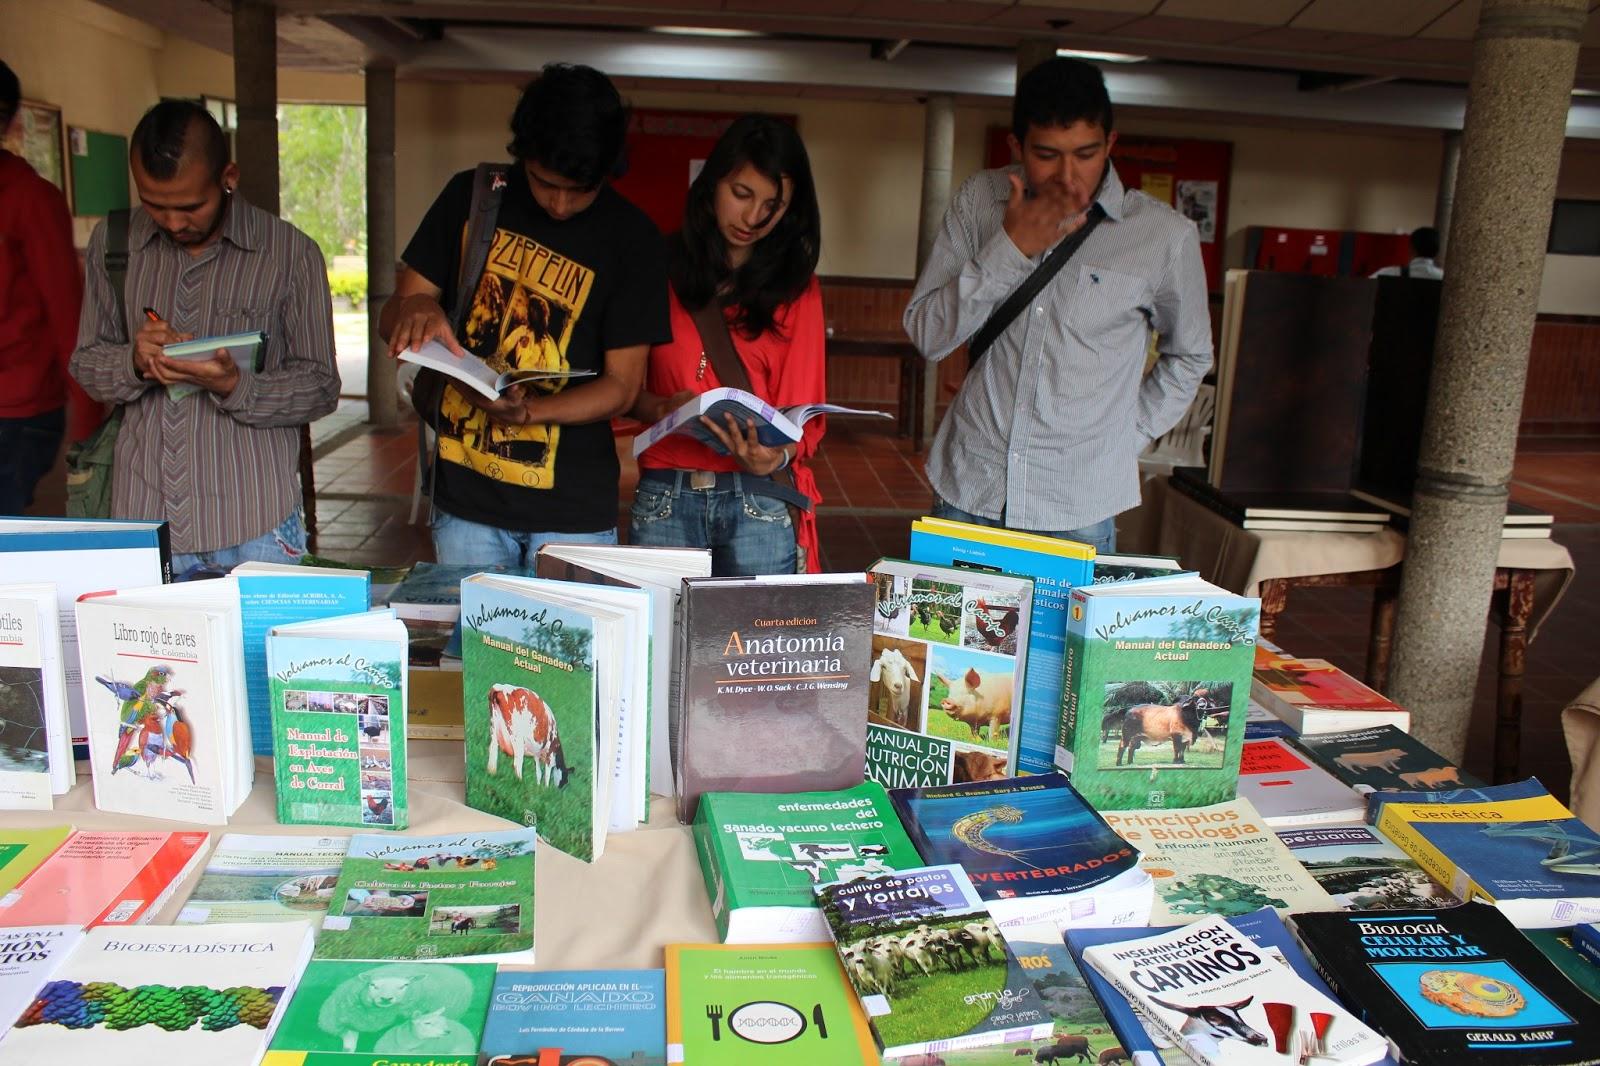 Sede uis m laga actividades cierre de primer semestre de 2013 for Oficina ing malaga